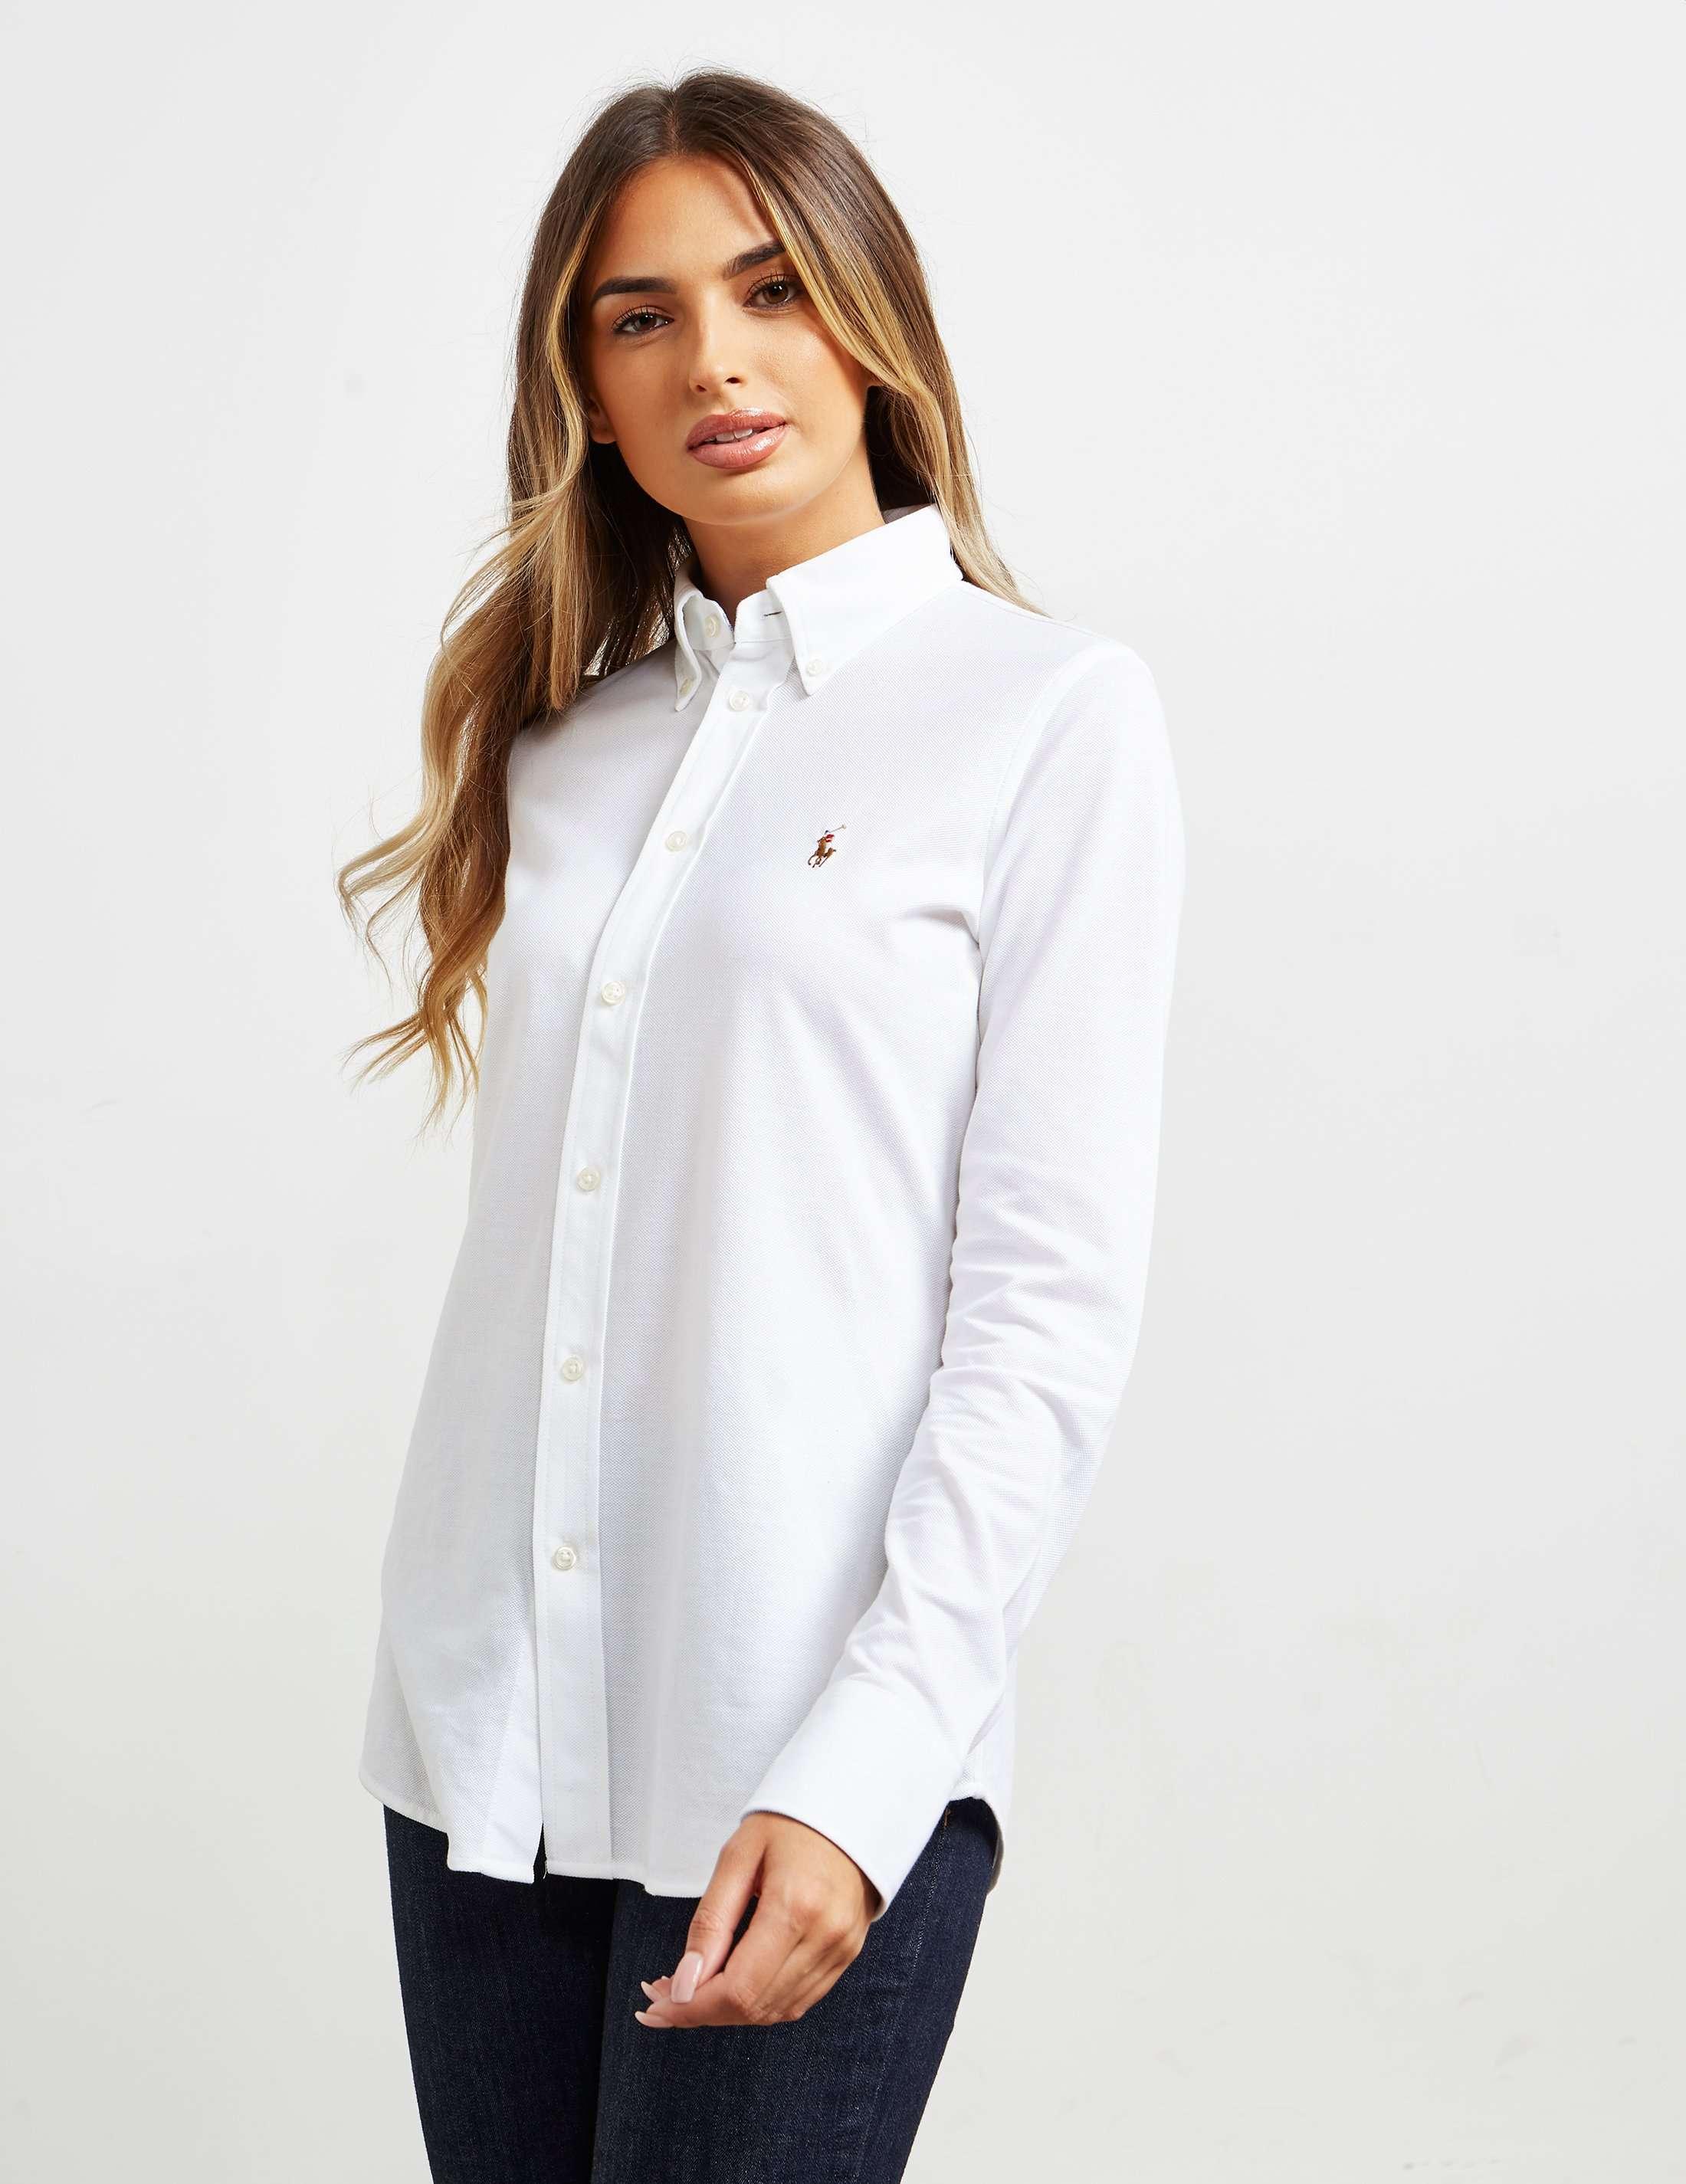 Brilliant Harper Long Sleeve Shirt - Polo Ralph Lauren - Blue - Blouses U0026 Shirts - Clothing - Women ...